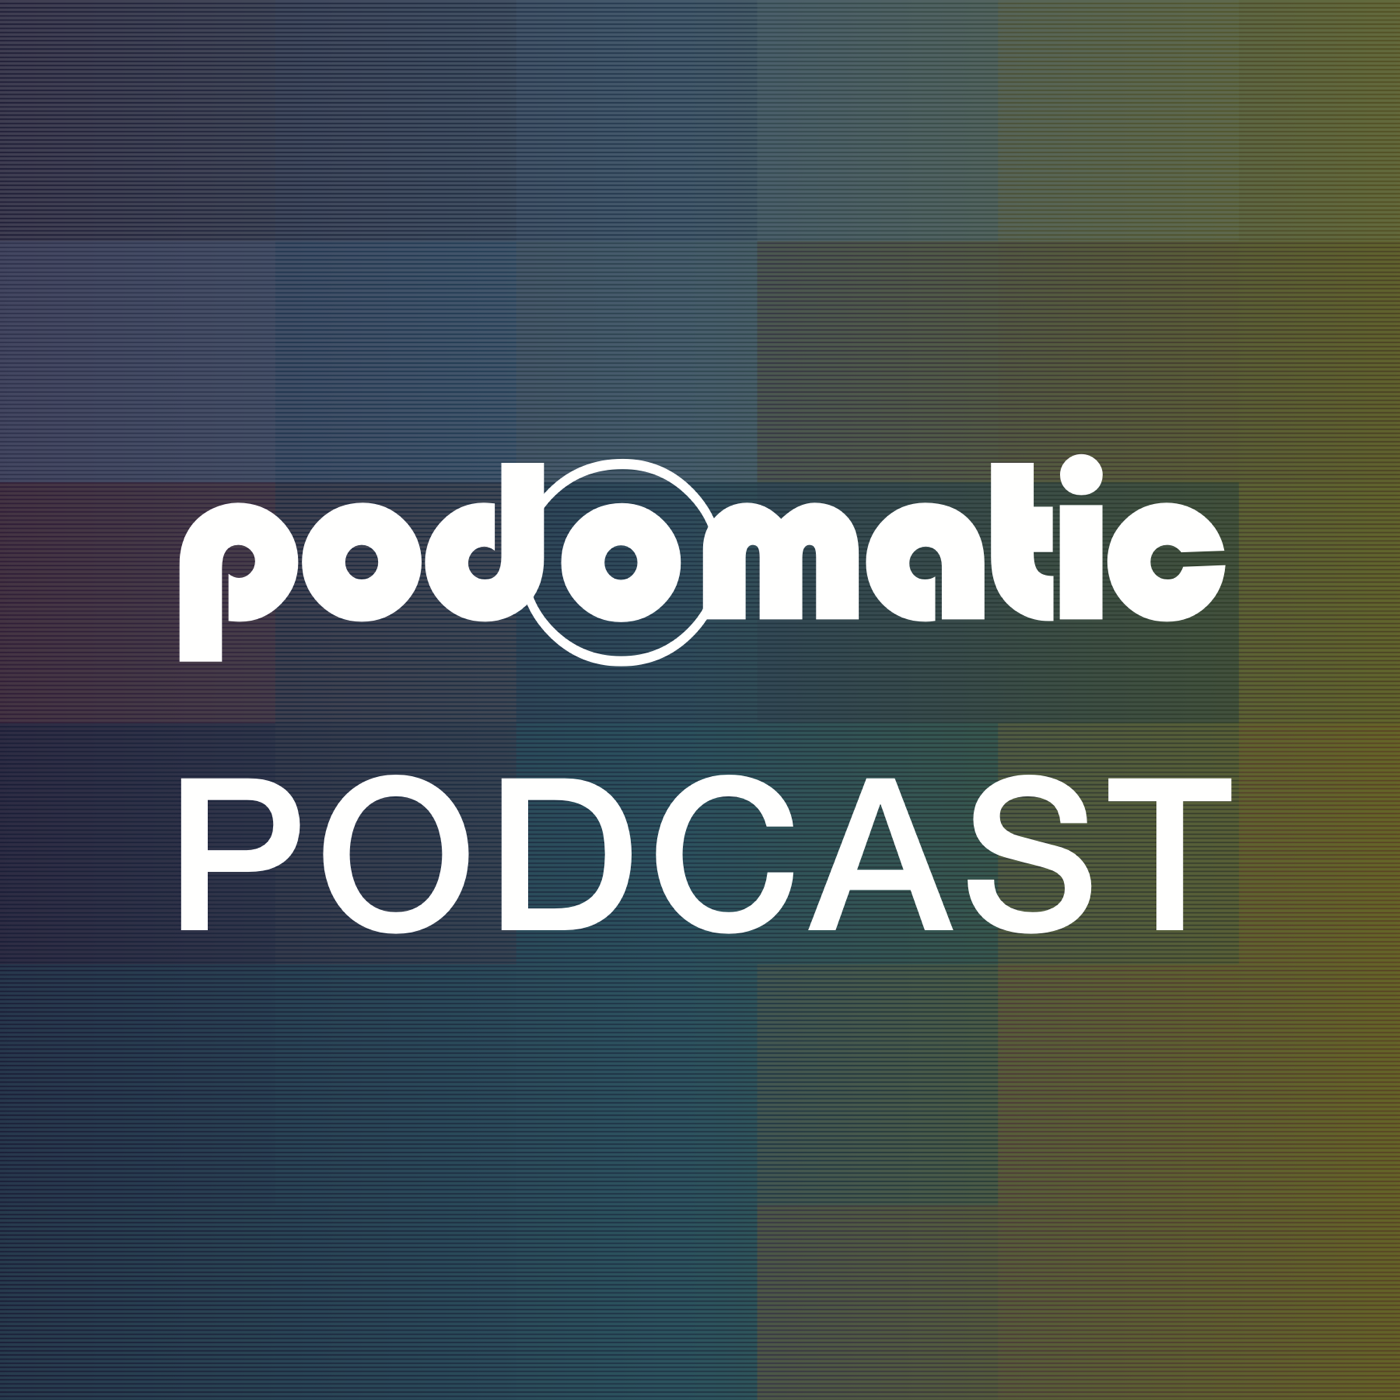 robertburian's Podcast